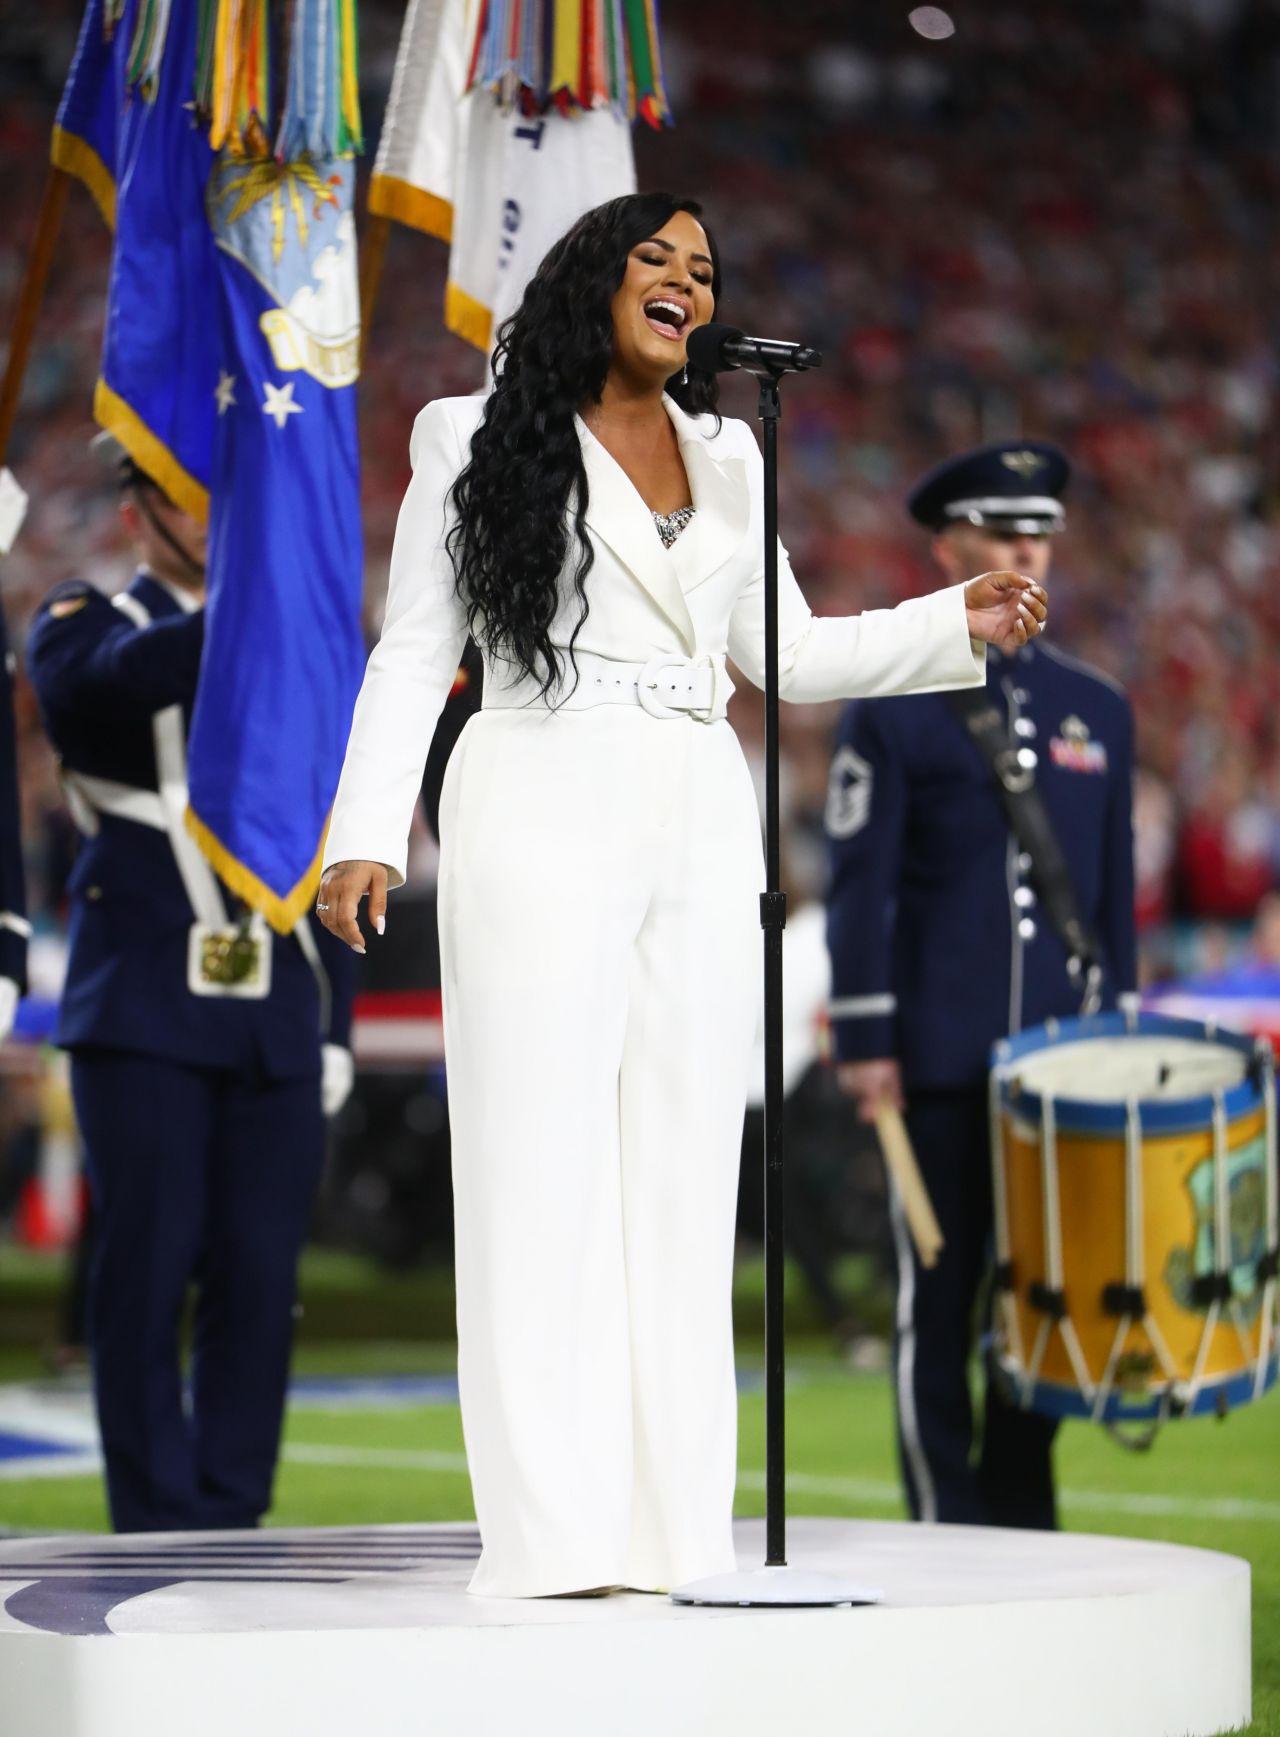 demi-lovato-in-sergio-hudson-sings-the-u-s-national-anthem-super-bowl-2020